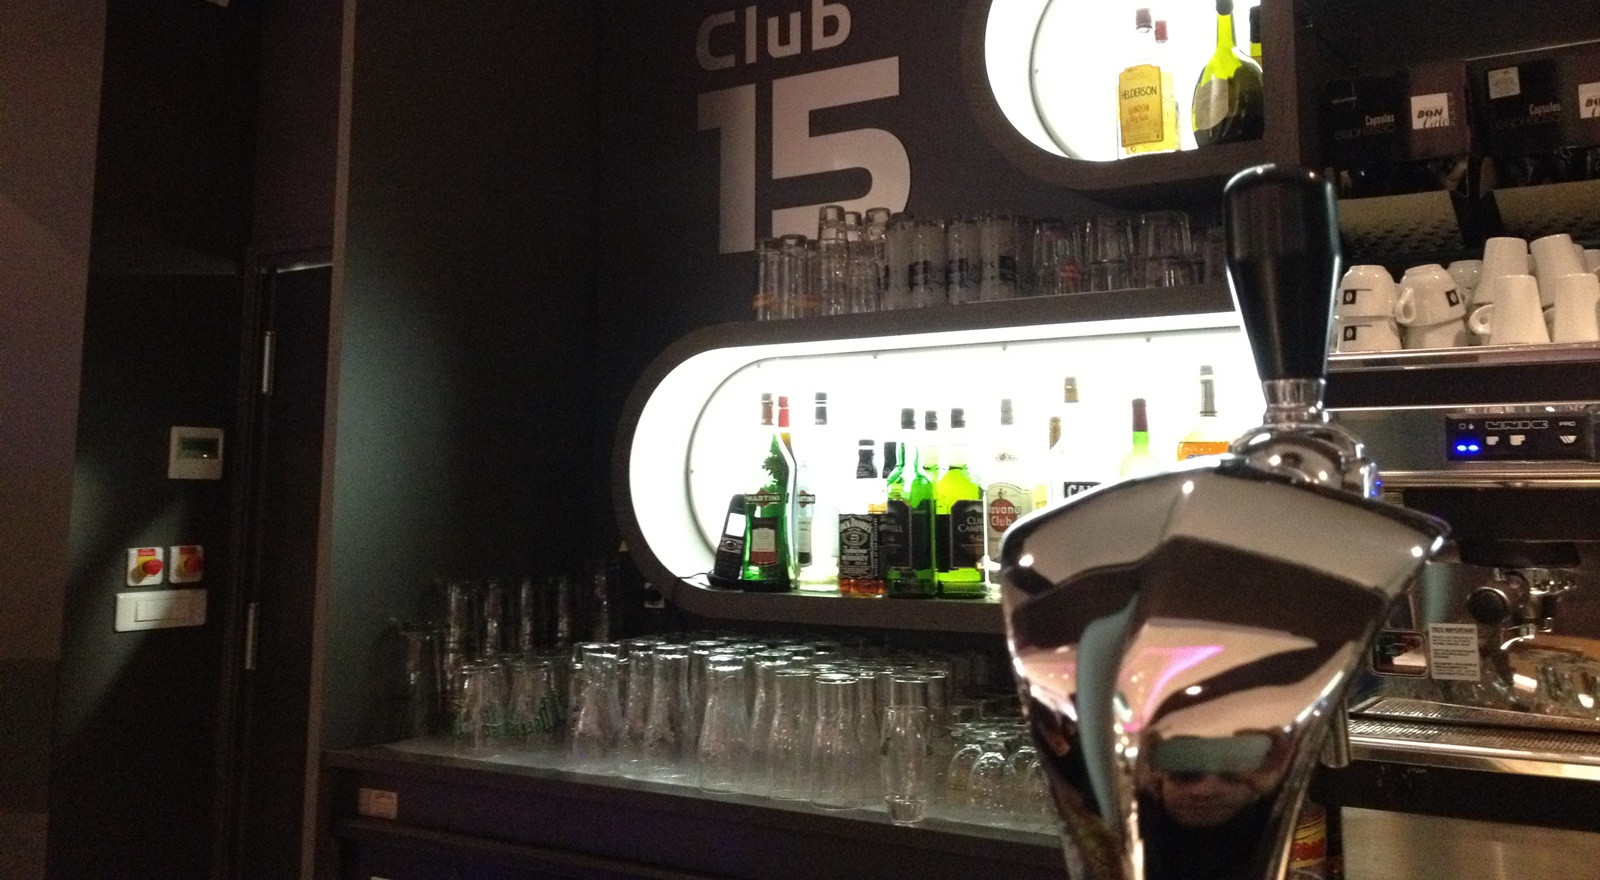 Club 15 (1).jpg